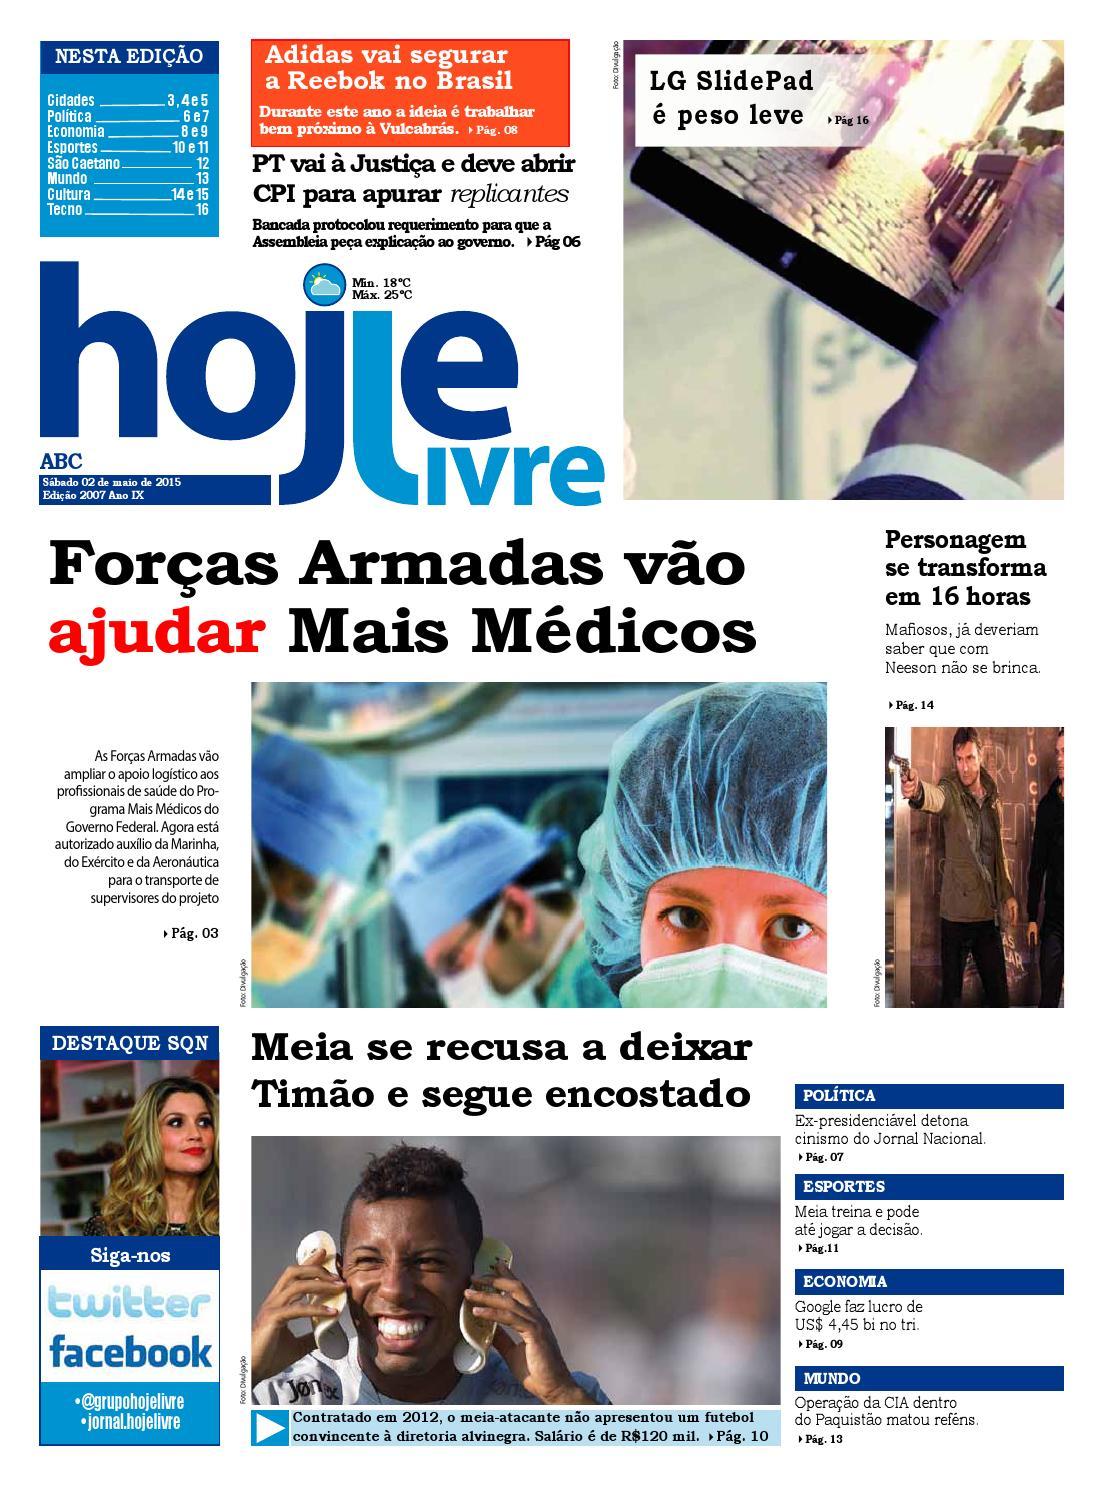 a911f5b78c4 Edição 2007 - 02 05 15 by Jornal Hoje Livre - issuu